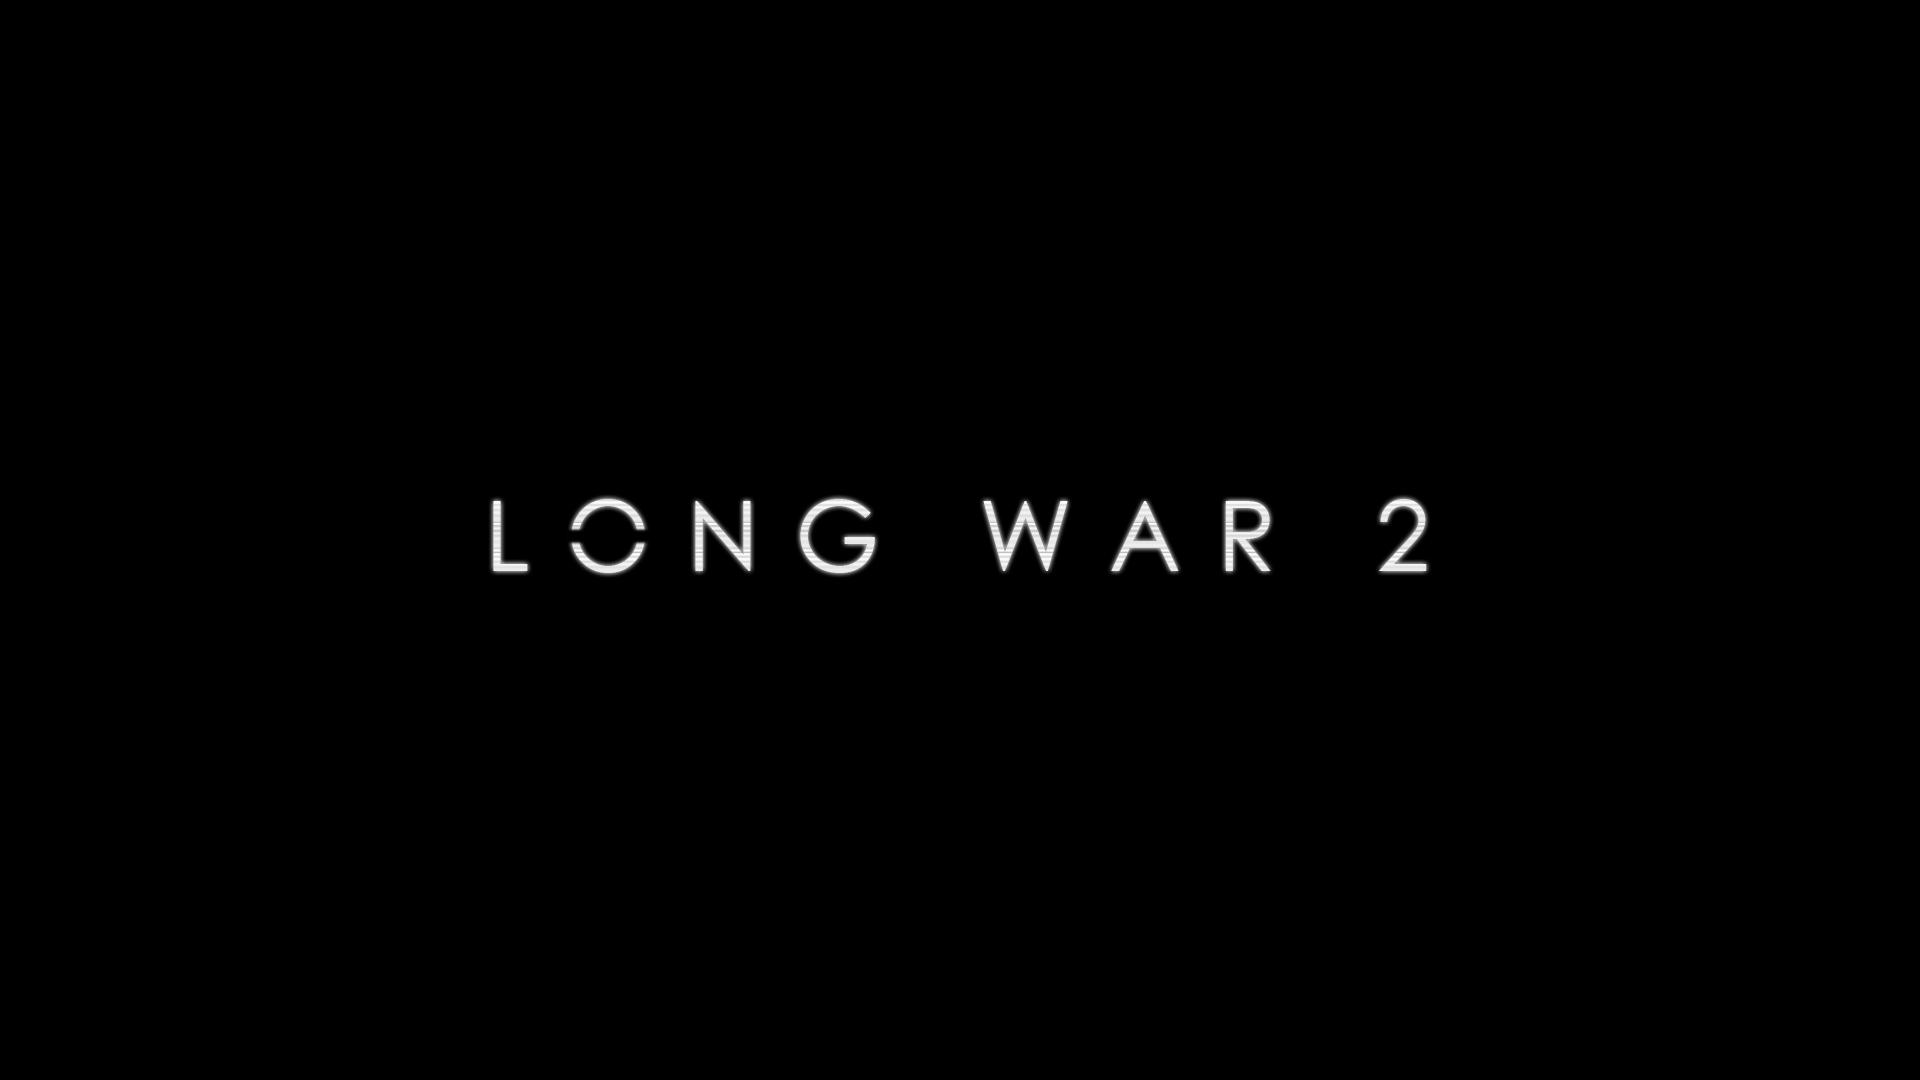 Habra Mod Long War 2 Para Xcom 2 En Pc 3djuegos